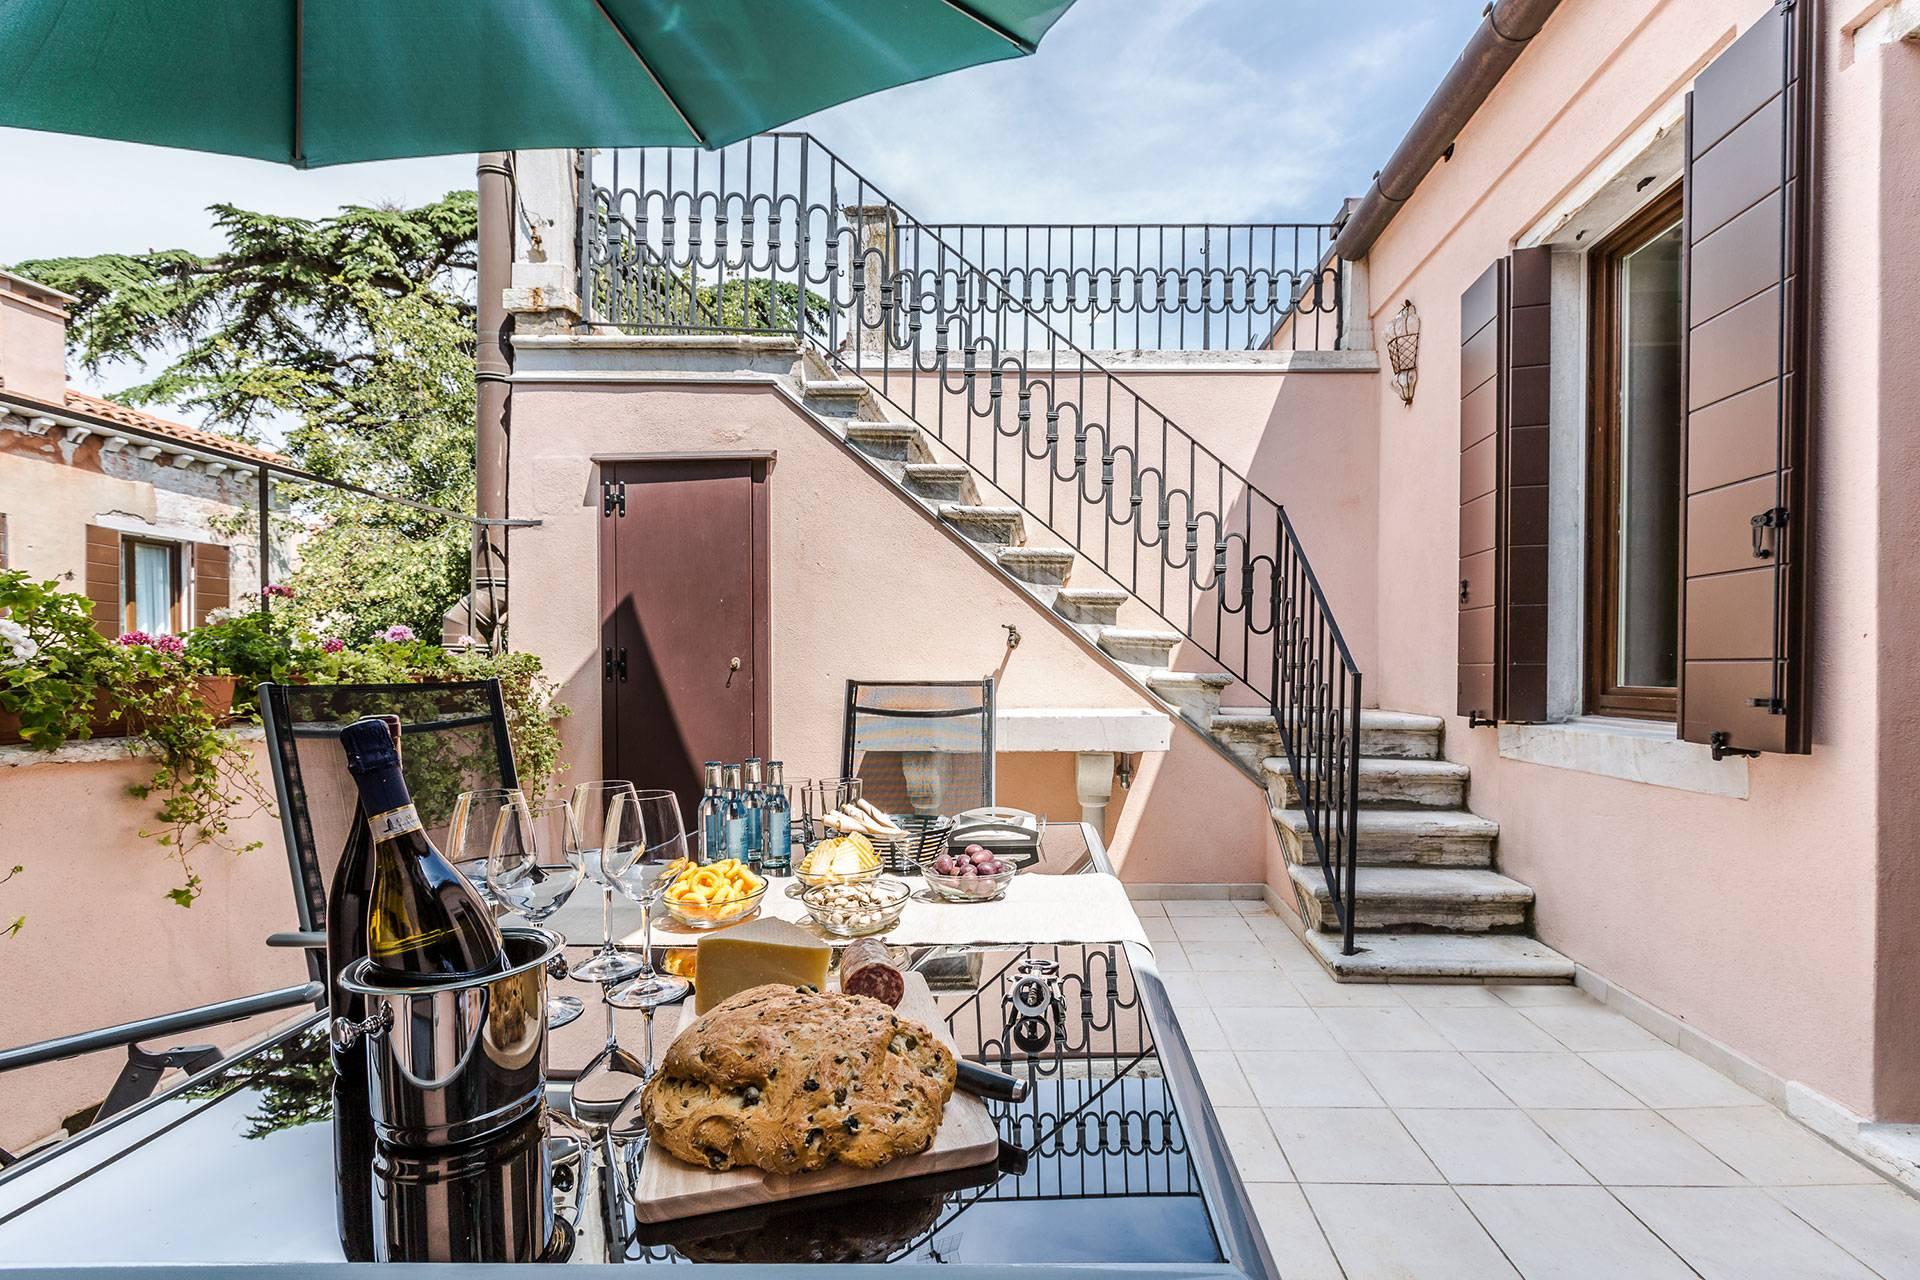 the beautiful shared terrace